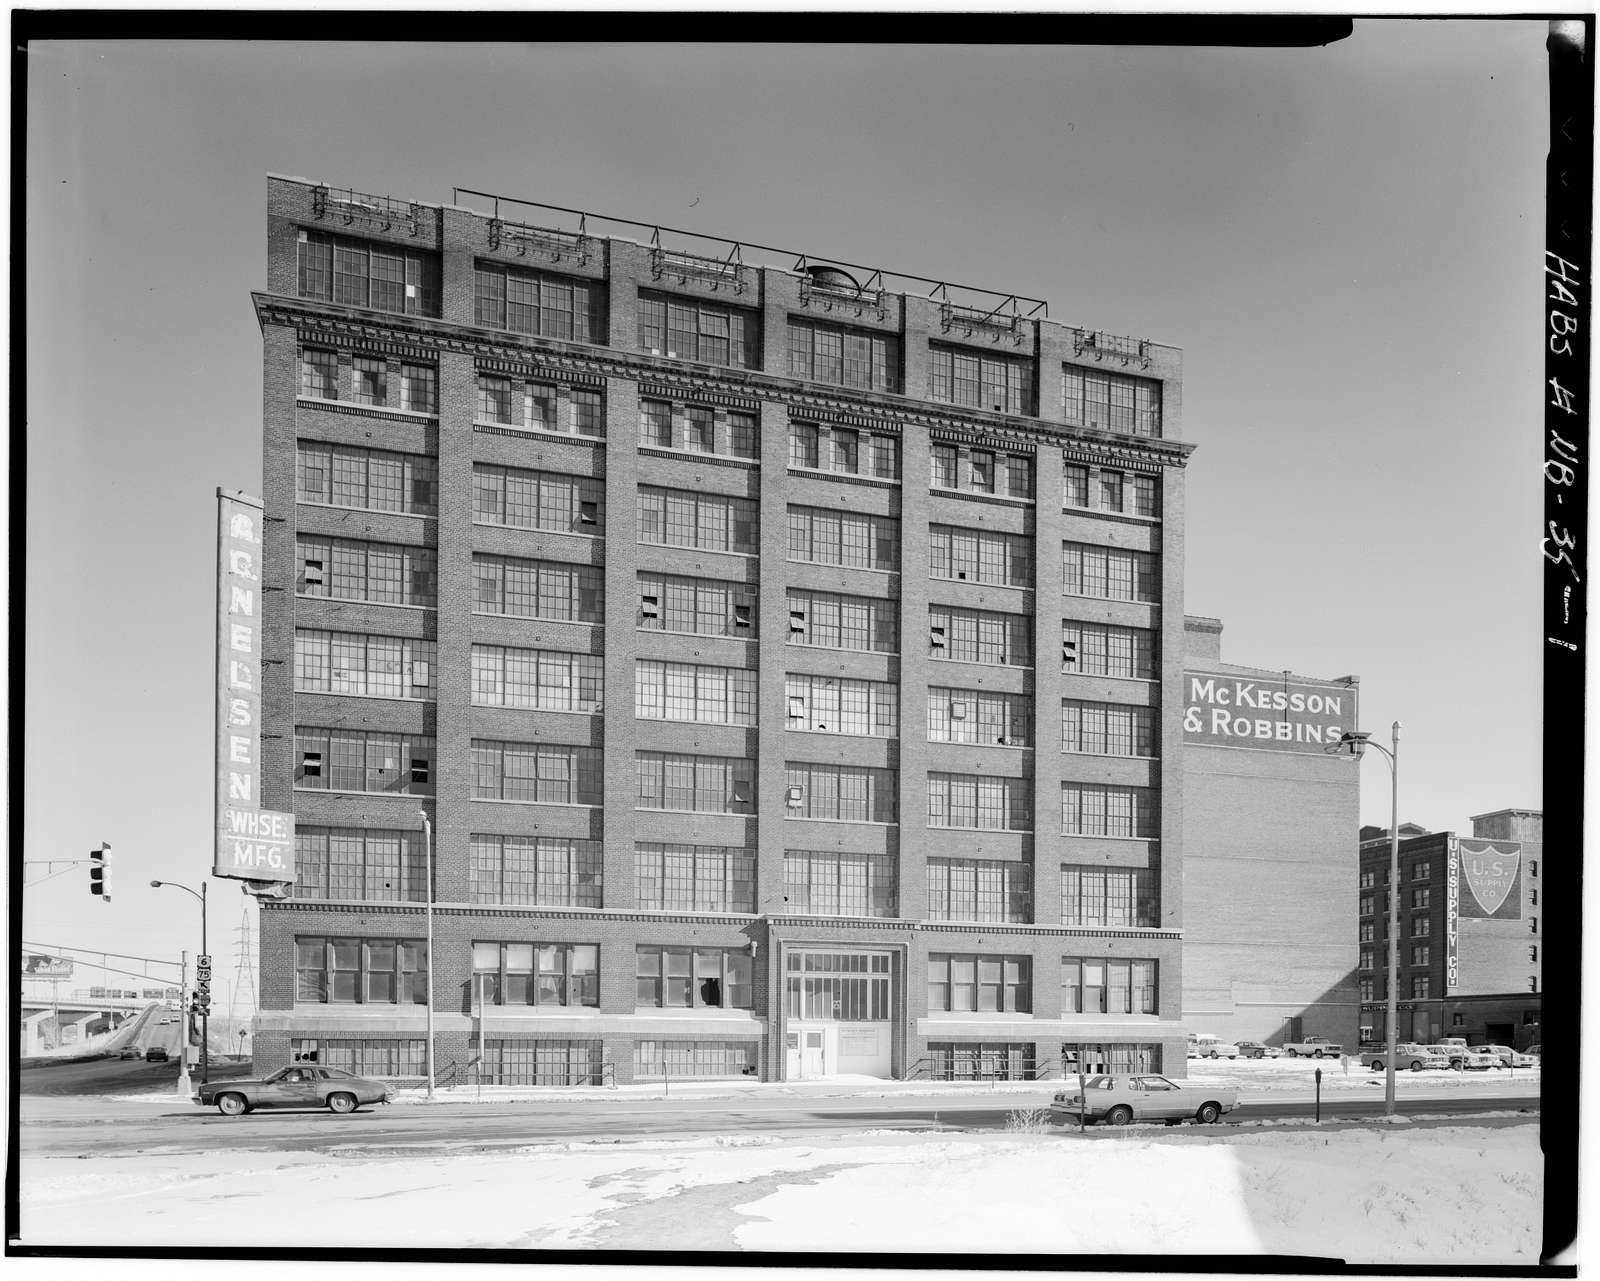 M. E. Smith Building, 201 South Tenth Street, Omaha, Douglas County, NE